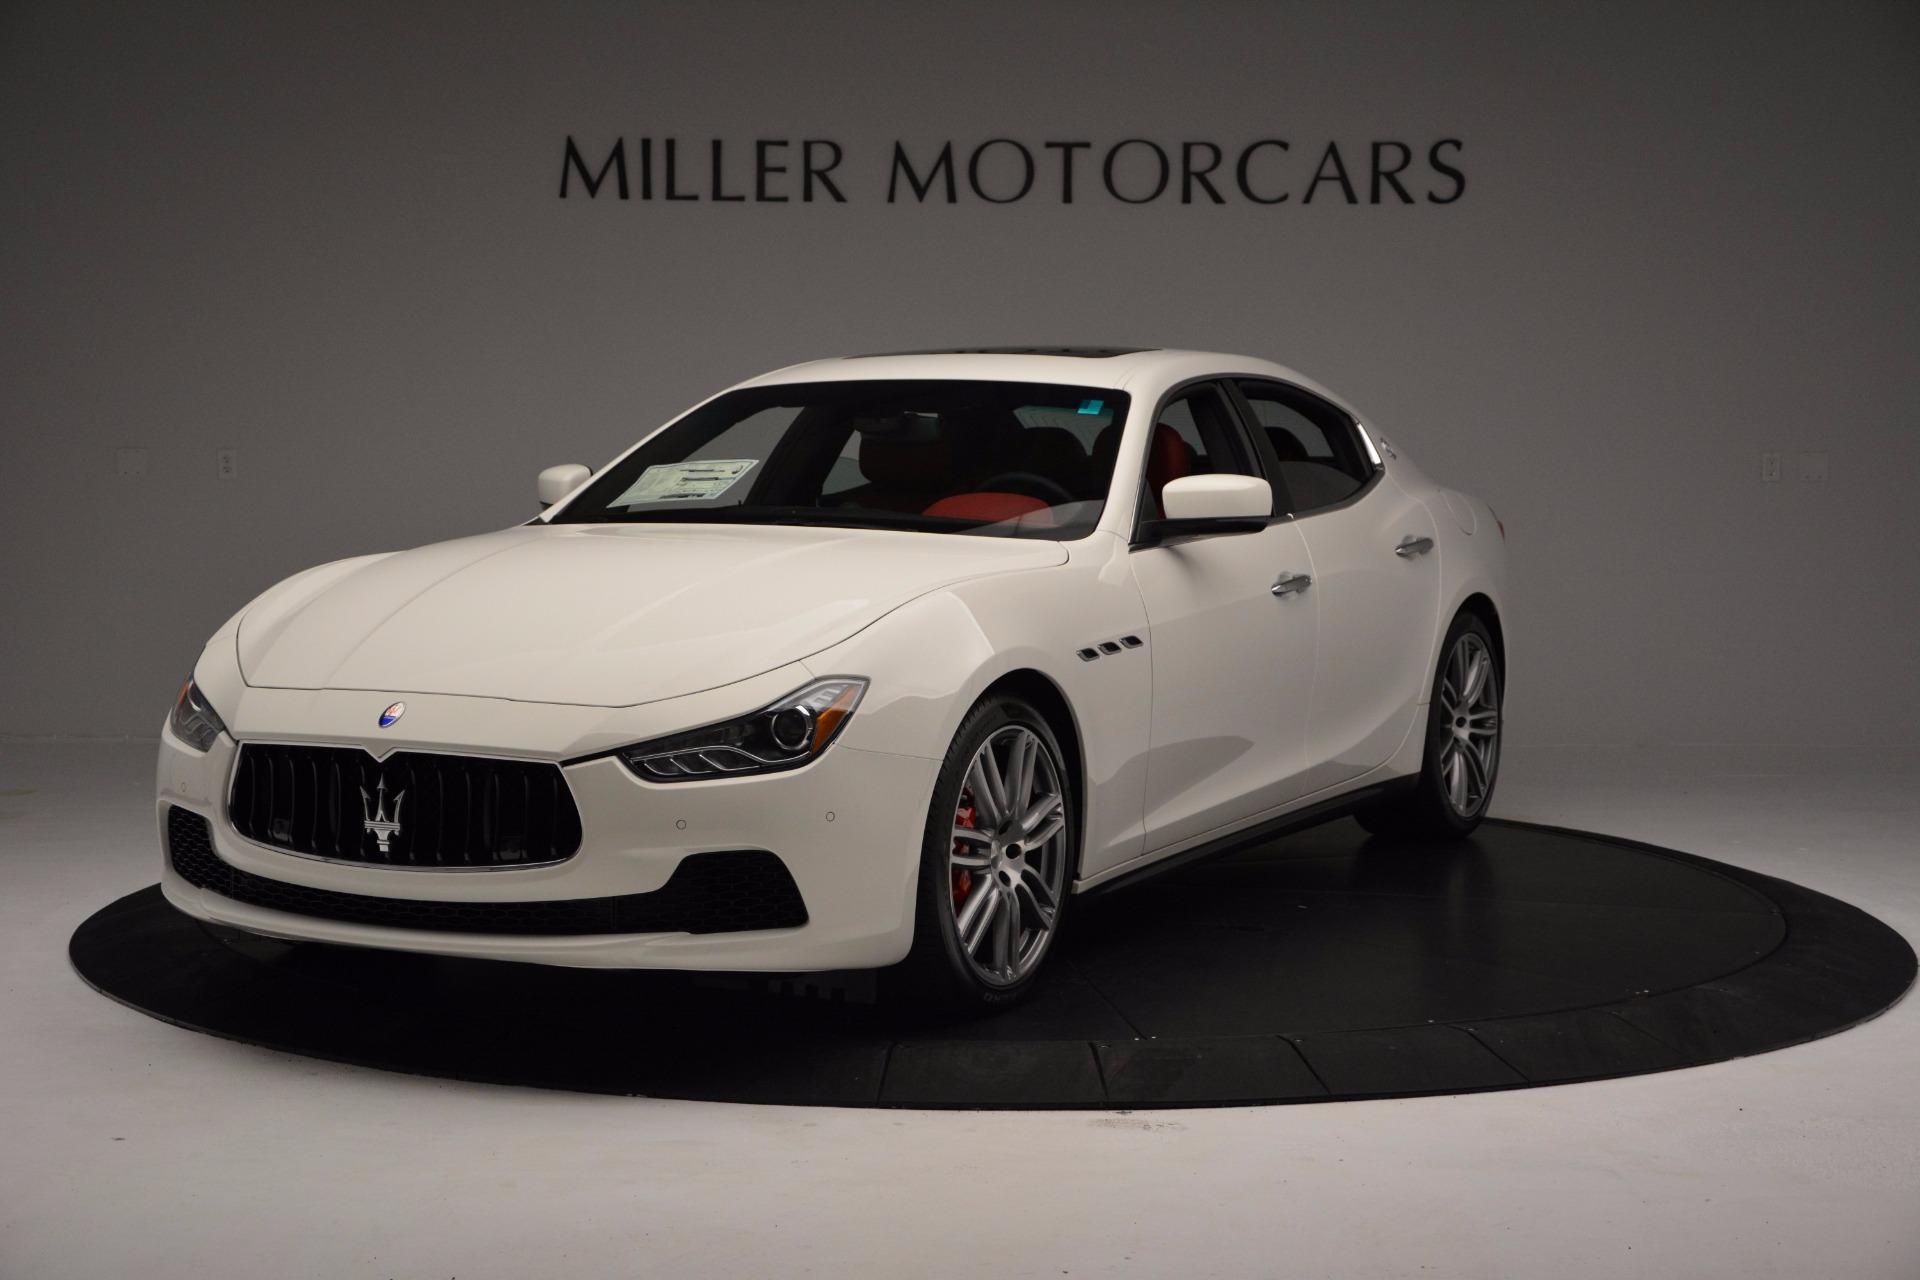 New 2017 Maserati Ghibli S Q4 For Sale In Greenwich, CT 1111_main